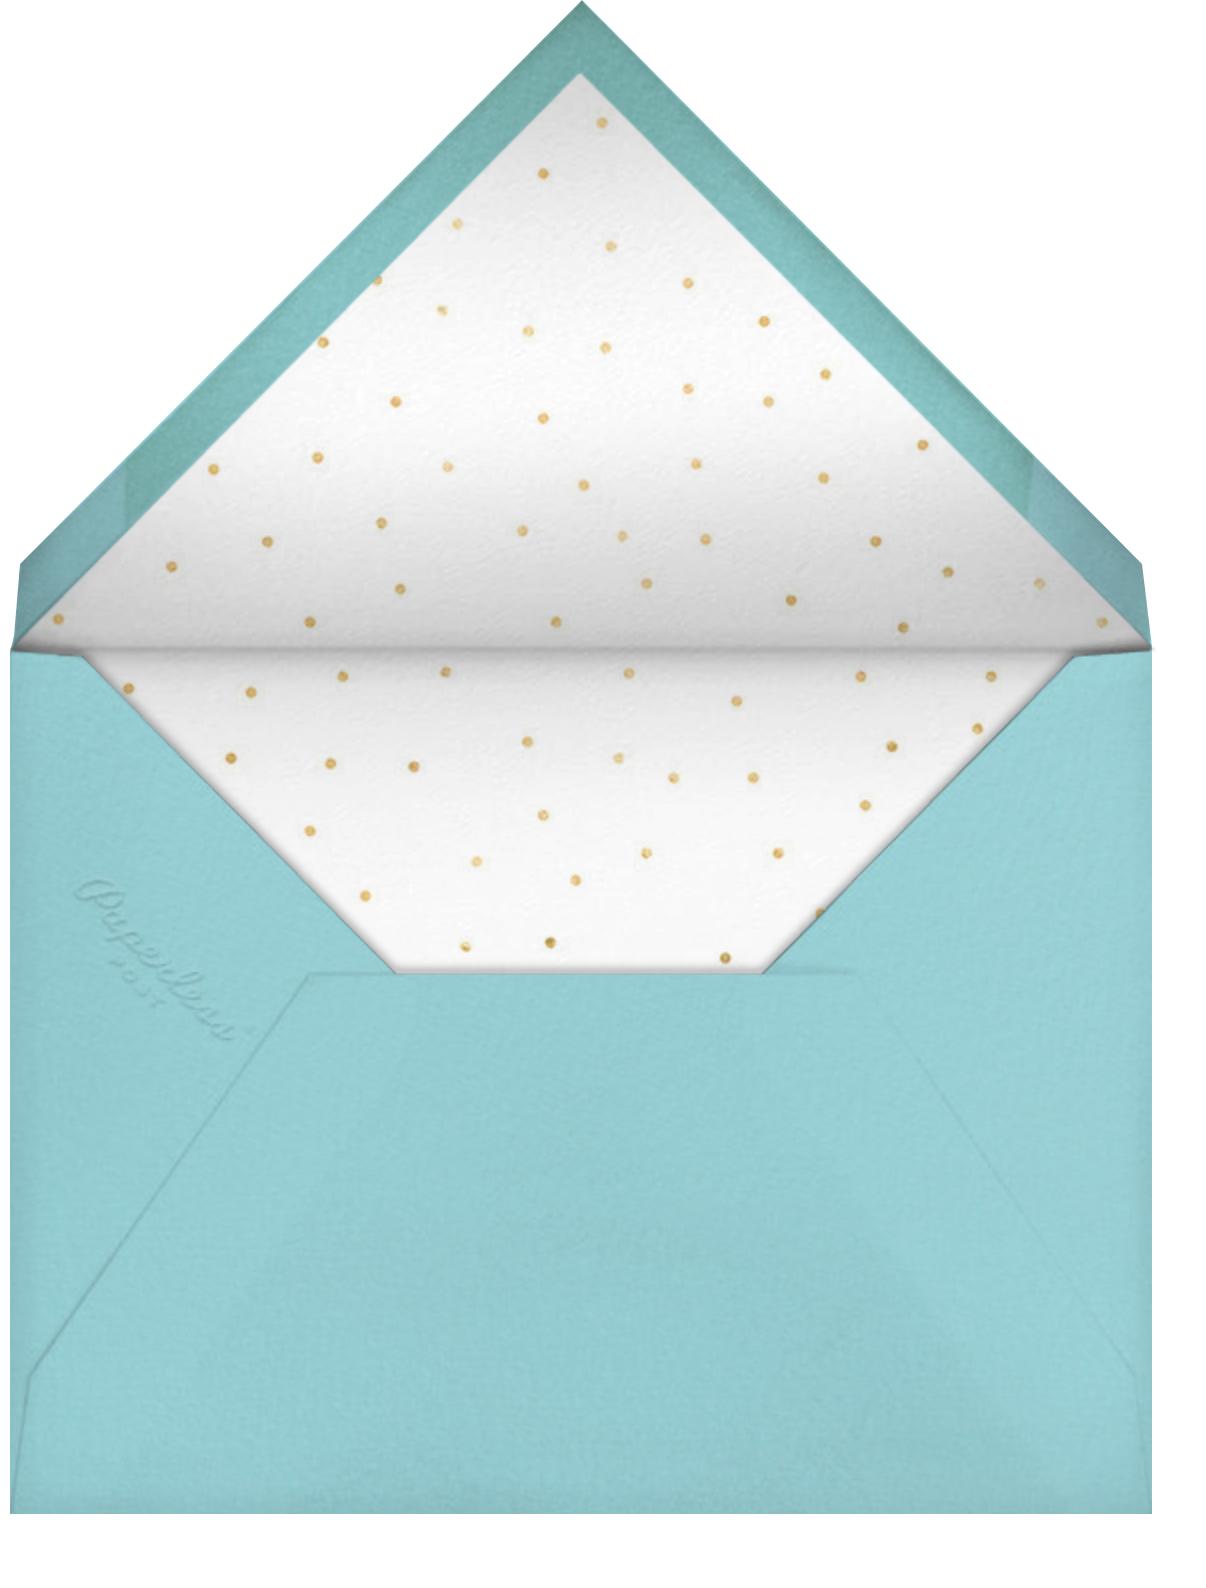 Twinkling Cake - TP - Paperless Post - Birthday - envelope back